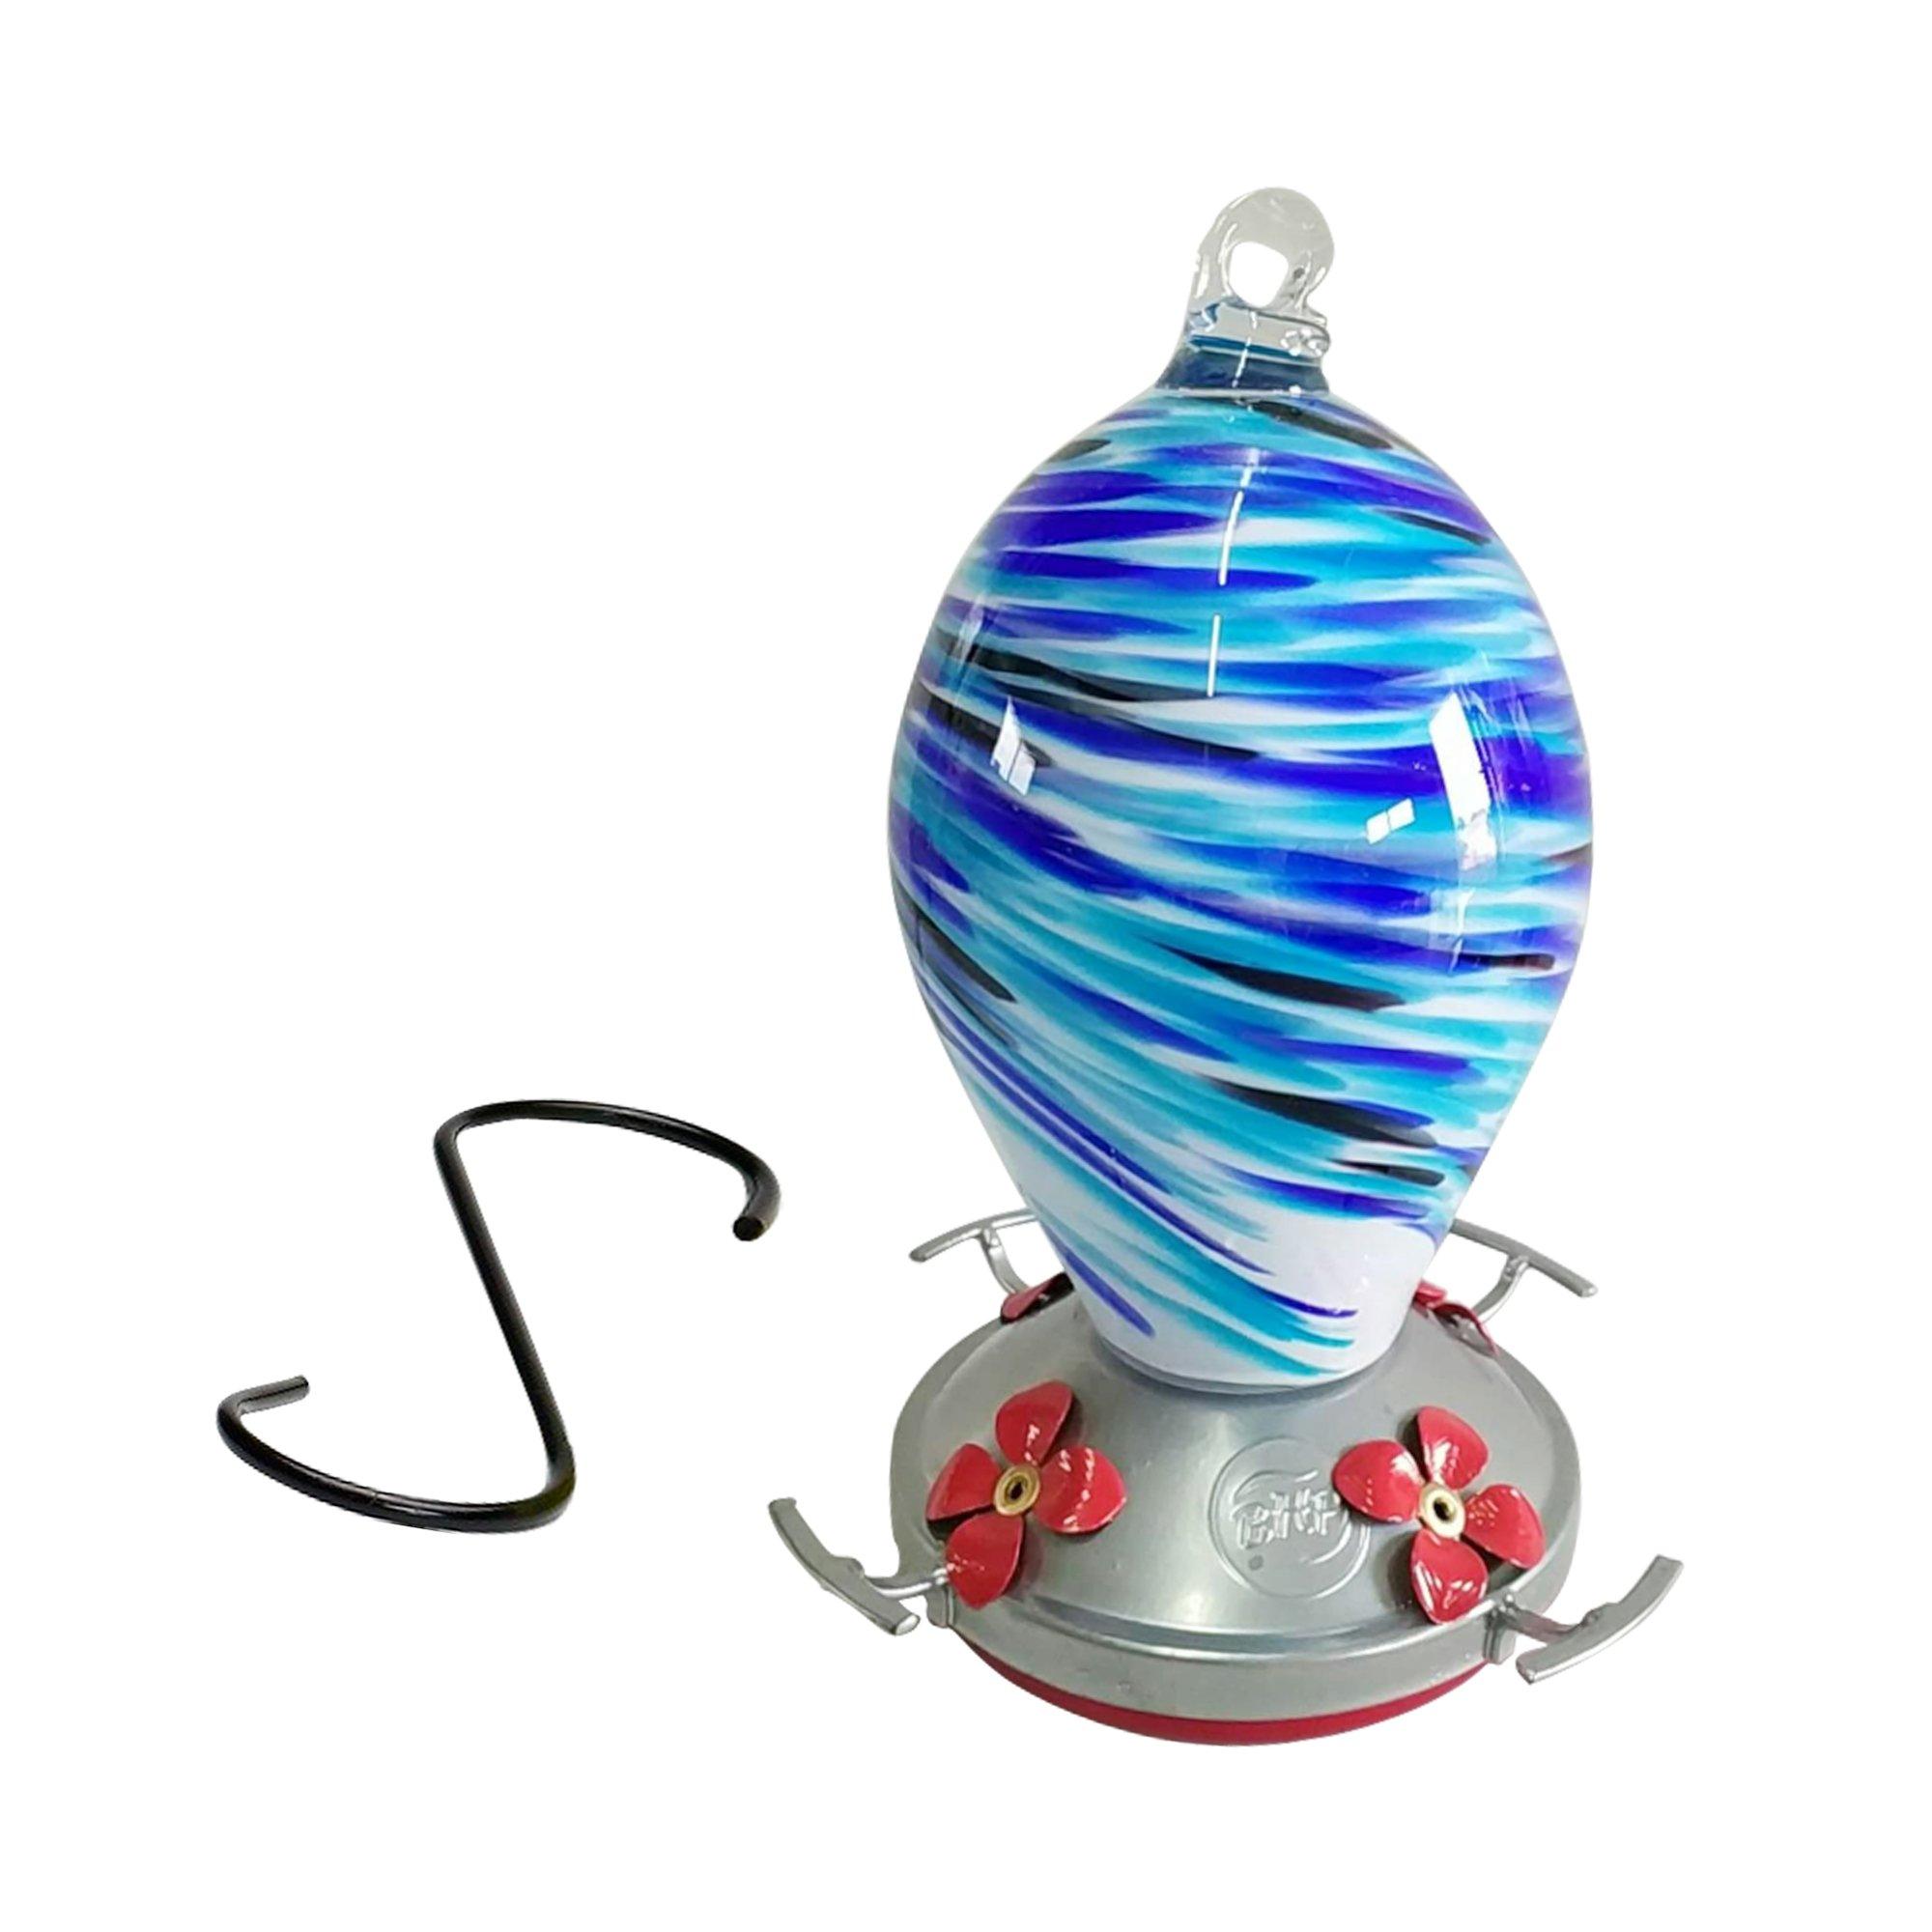 Best Home Products Hummingbird Feeder - Blown Glass - Blue Swirl - 24 Fluid Ounces